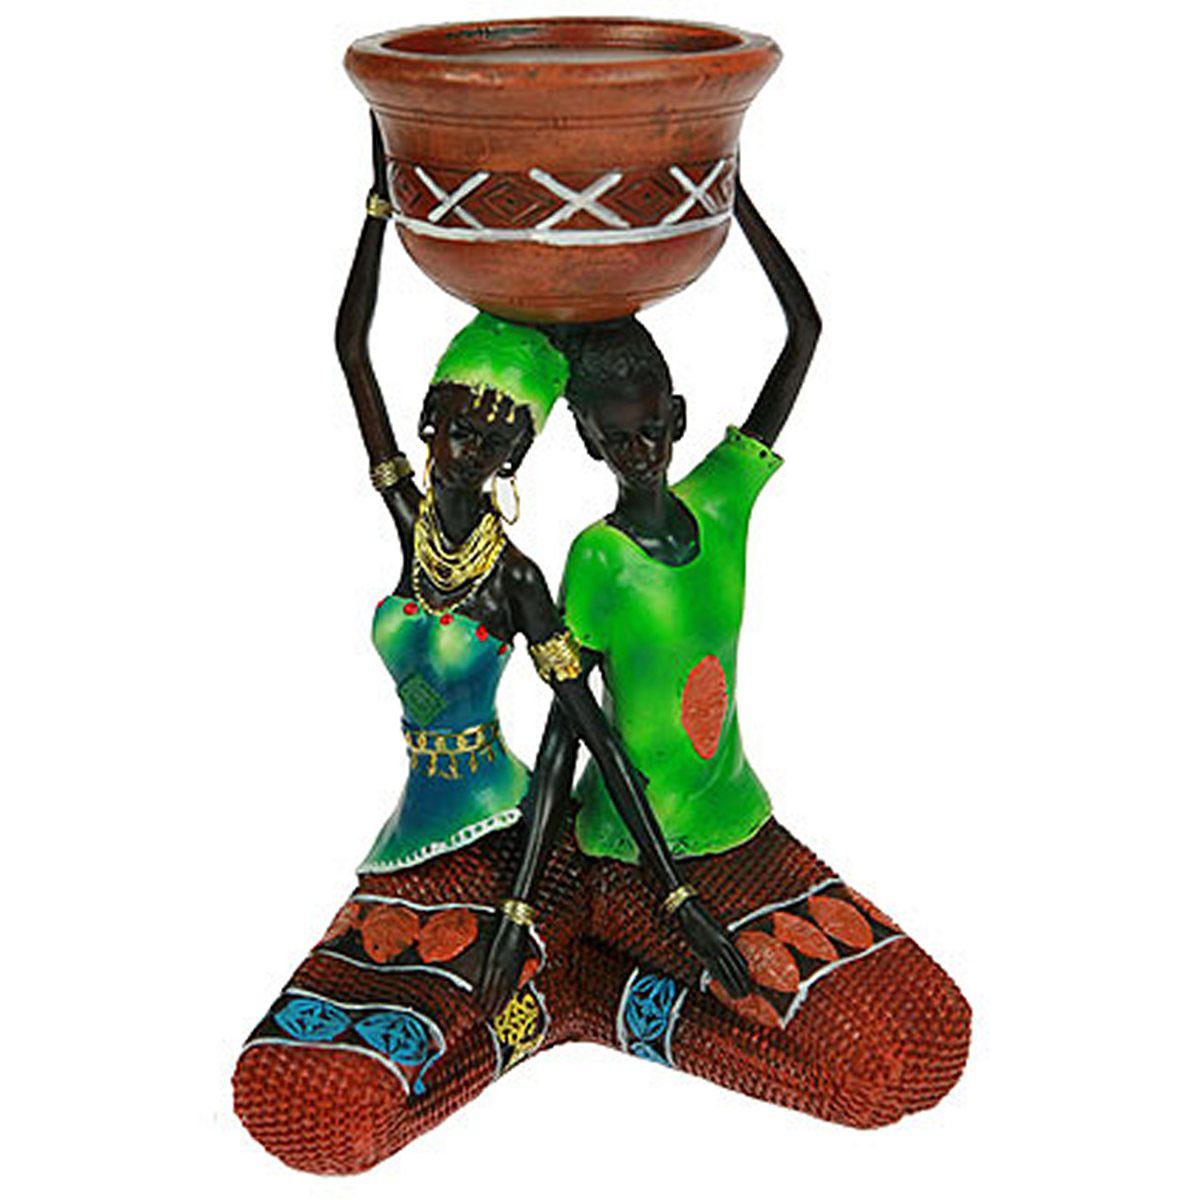 Статуэтка Русские Подарки Африканка, 16 х 12 х 23 см. 26128 статуэтка русские подарки африканка 6 х 11 х 20 см